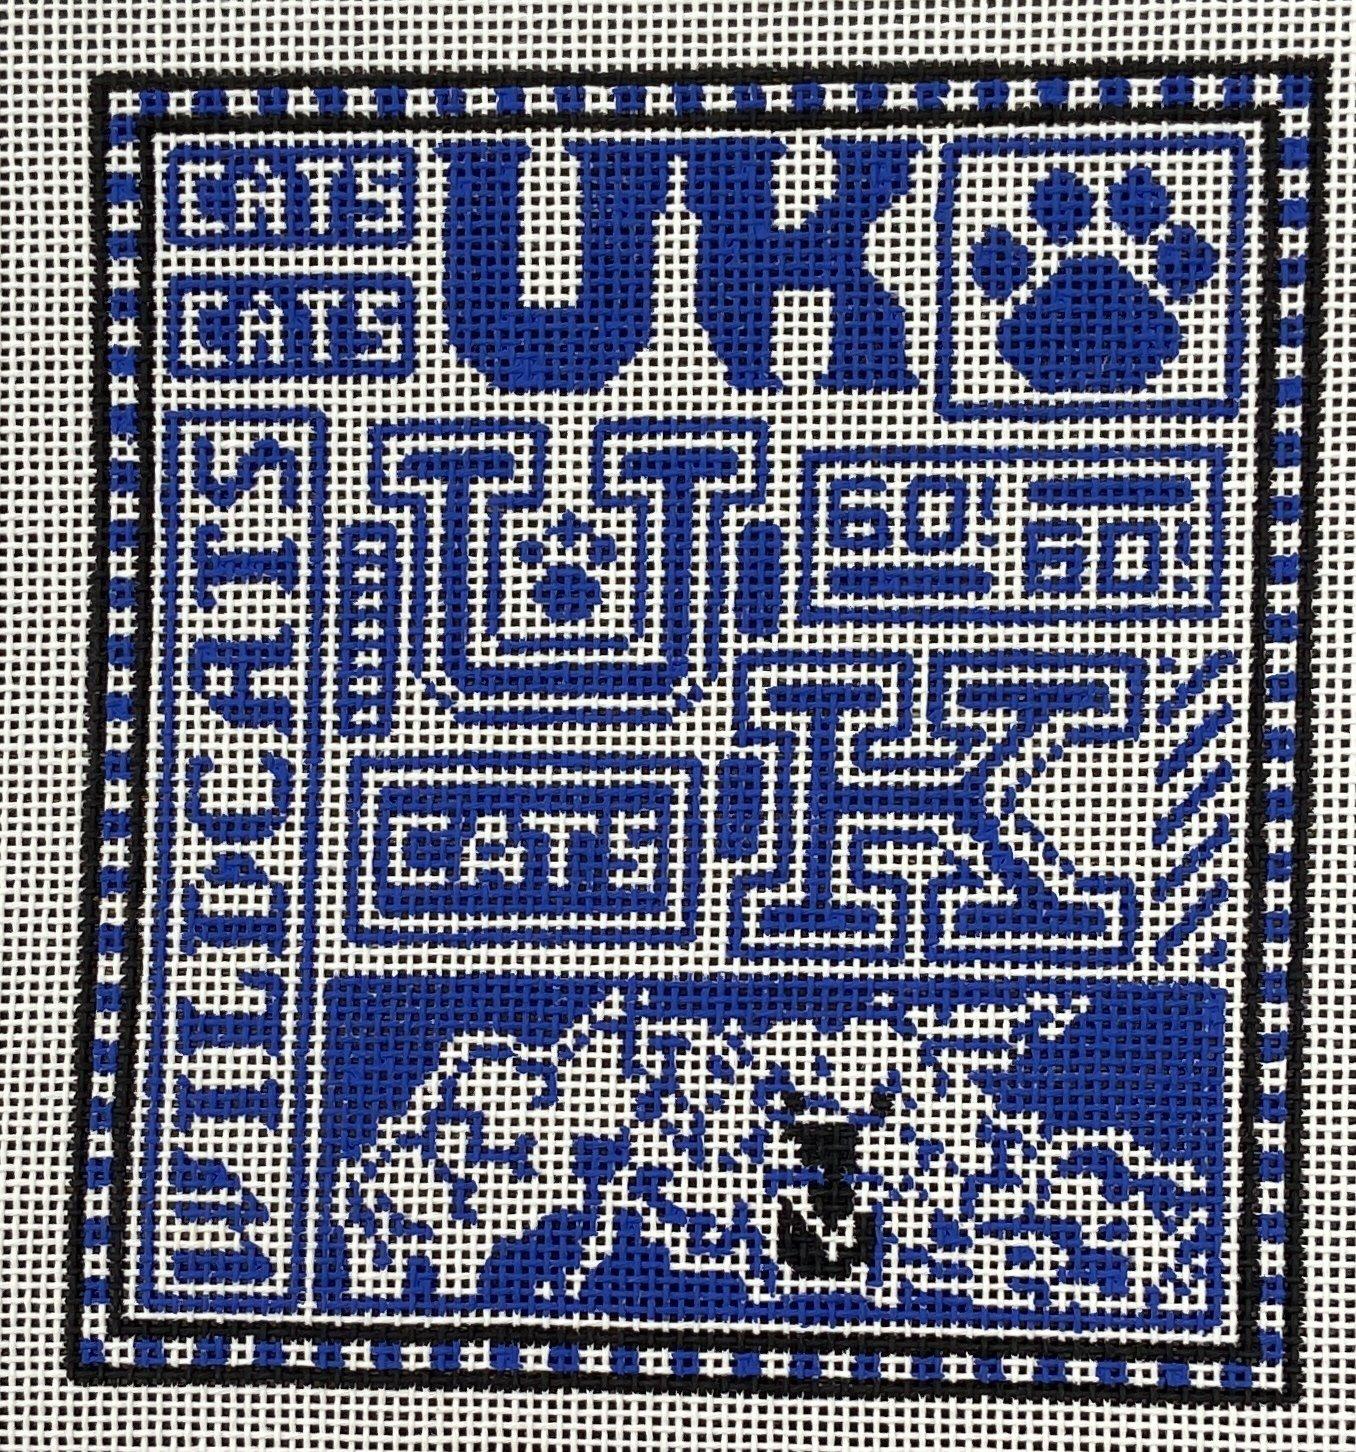 T40K University of Kentucky